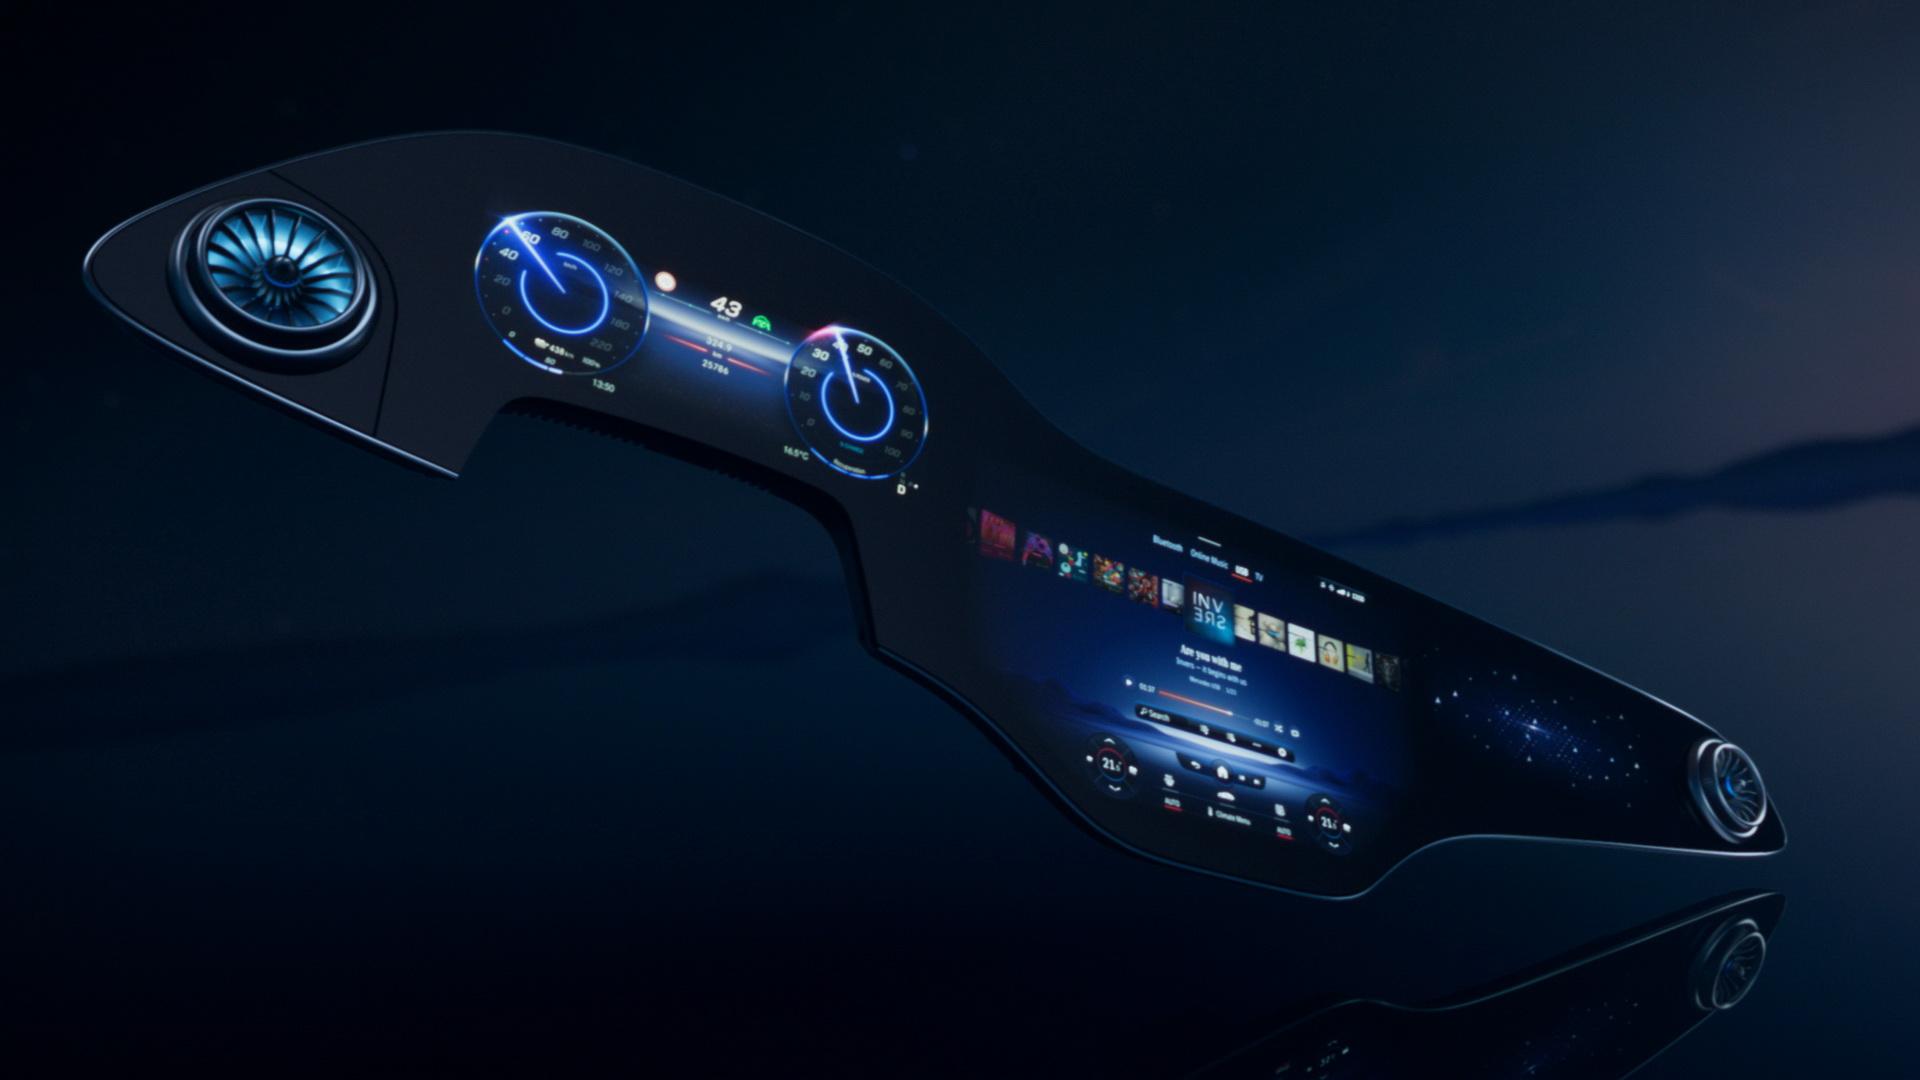 Hyperscreen: Η Mercedes-Benz κάνει όλο το ταμπλό… οθόνη! [vid]